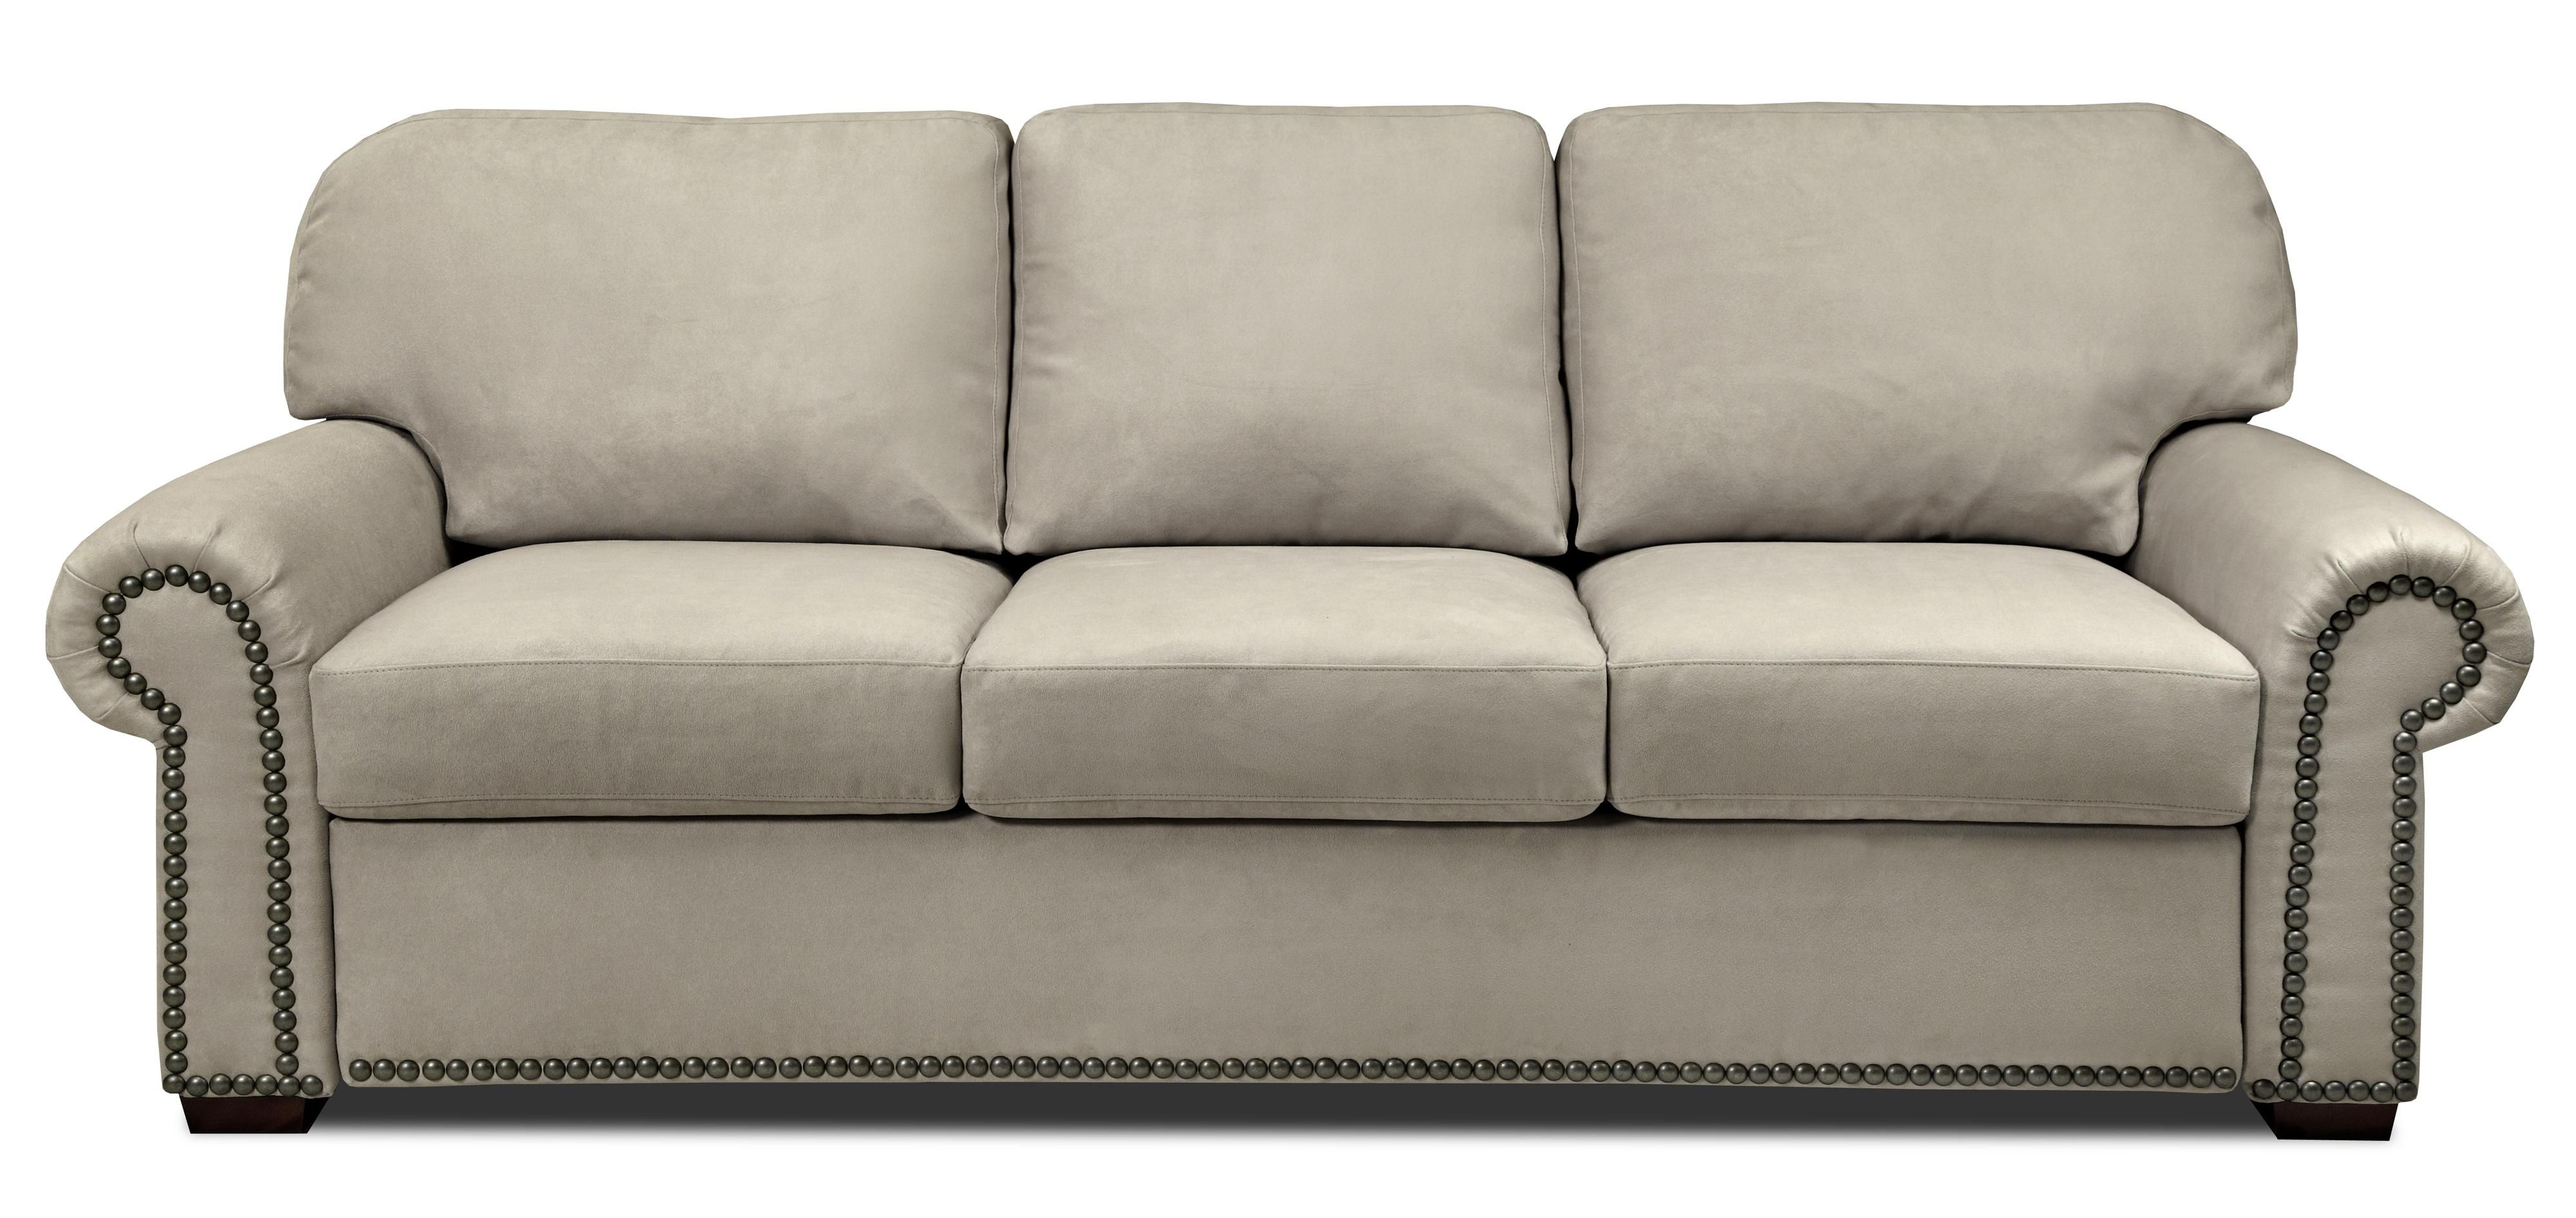 Comfort Sleeper Makayla Queen Plus Sofa Sleeper By American